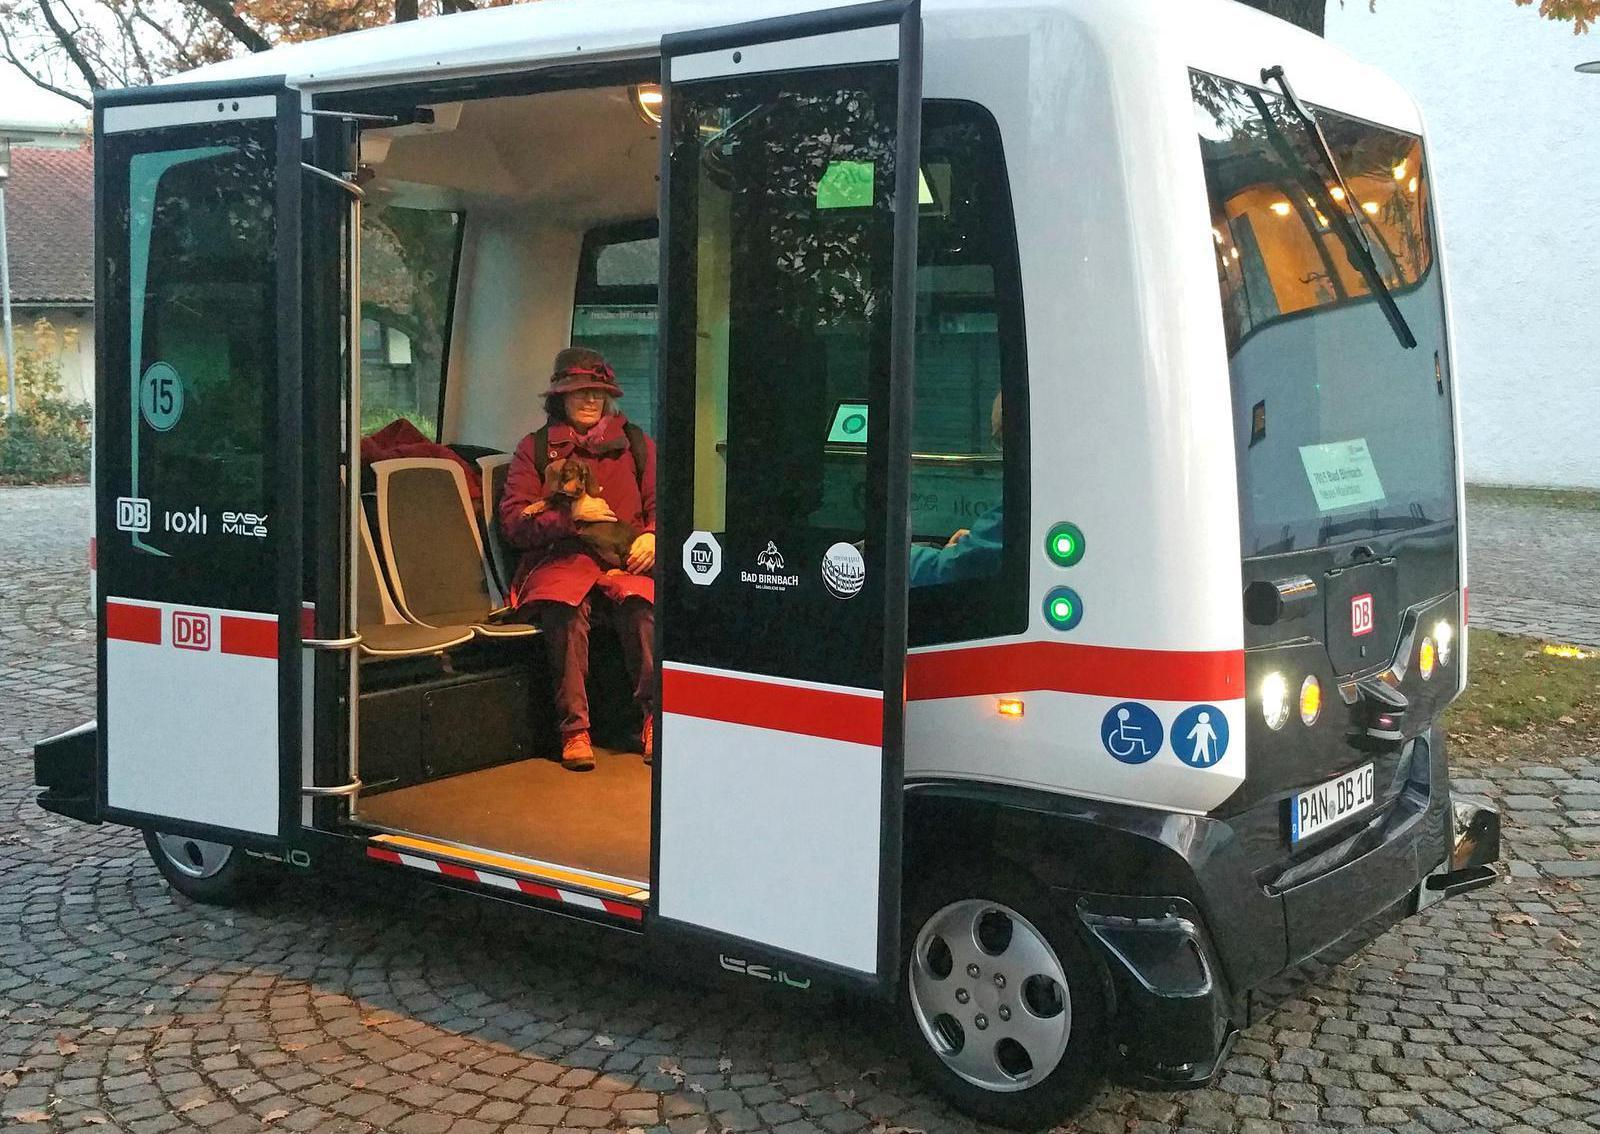 Mobilitätswende Image 5